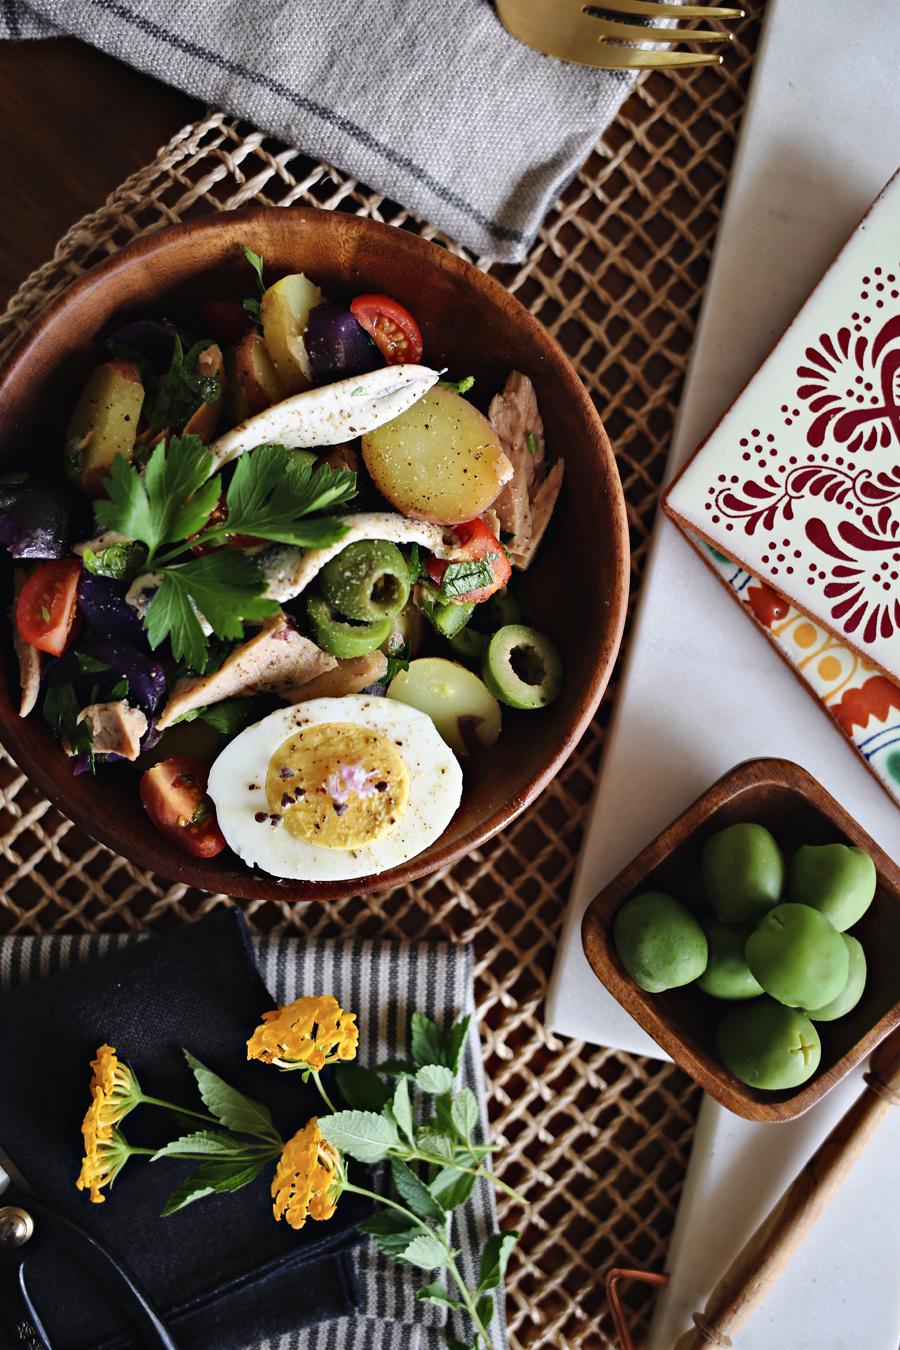 04_spanish-potato-salad_dine-x-design